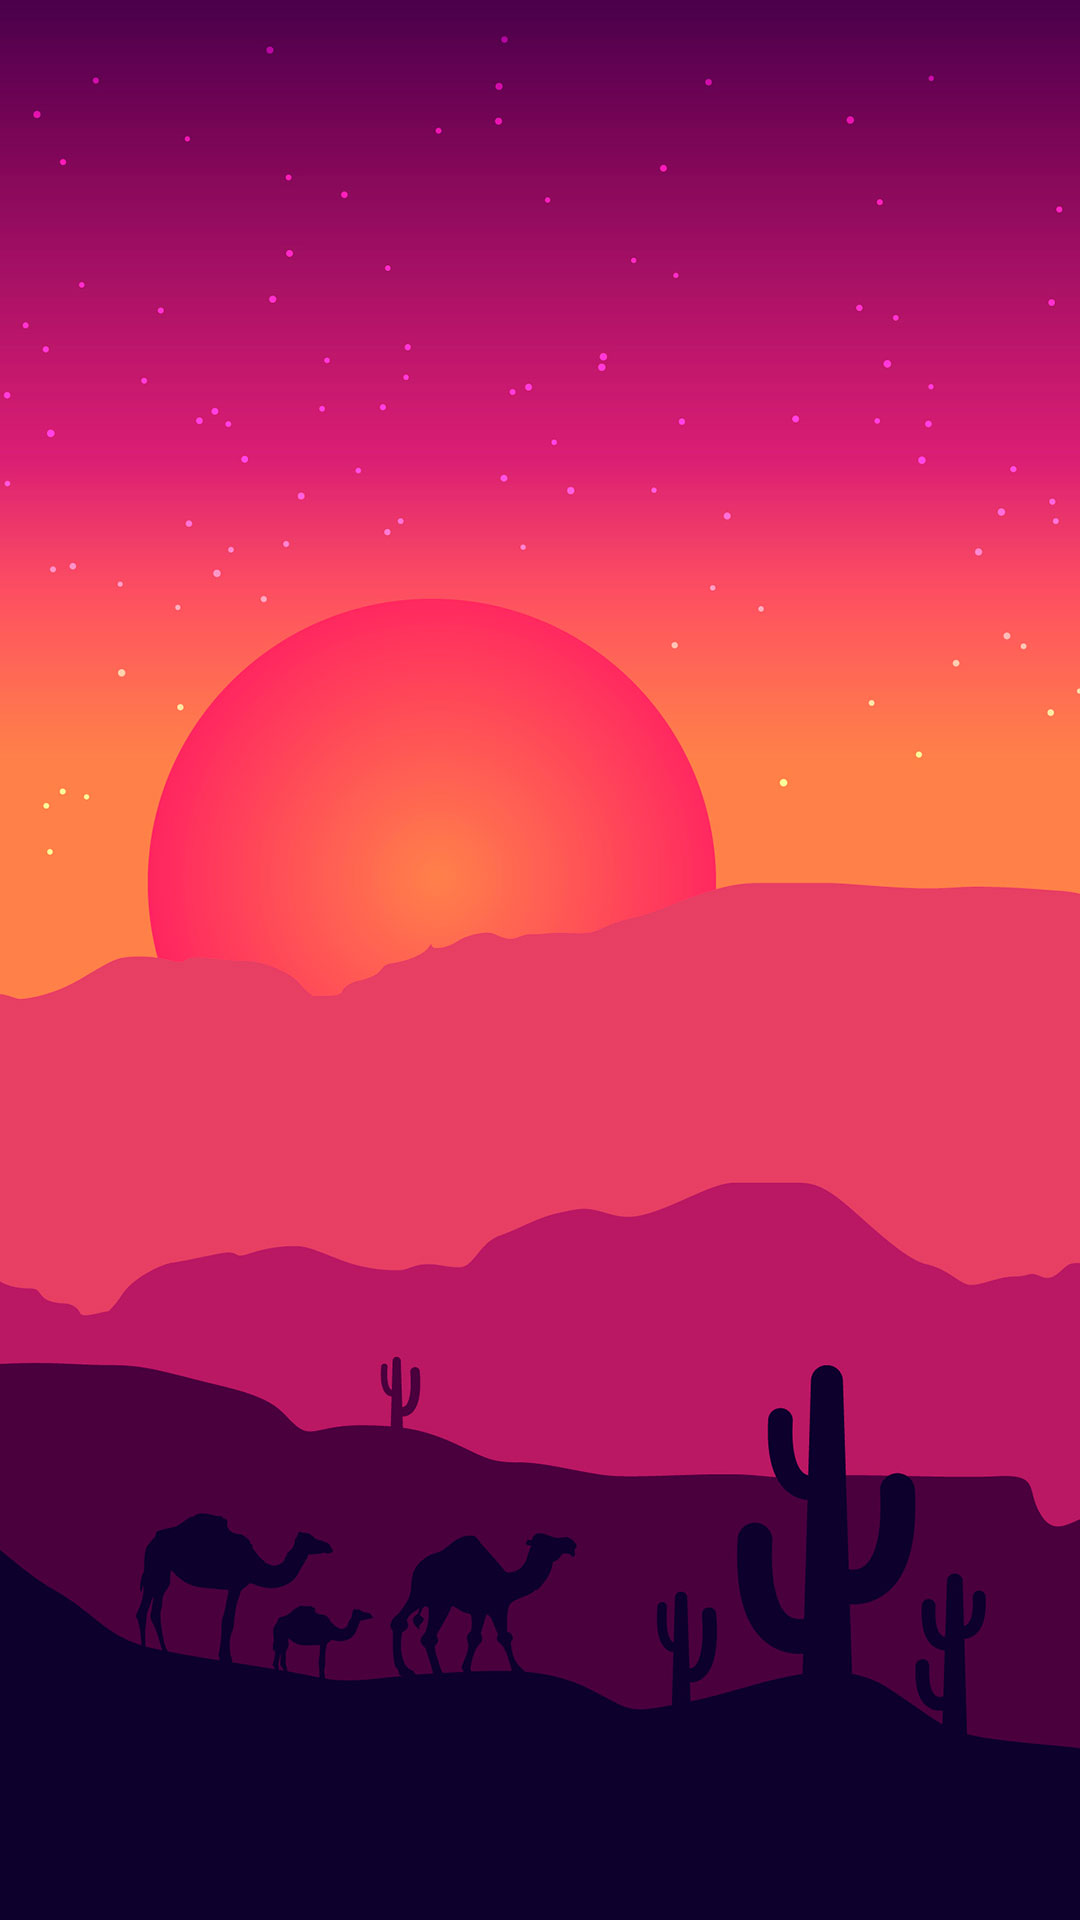 iPhone wallpaper illustration2 Illustration